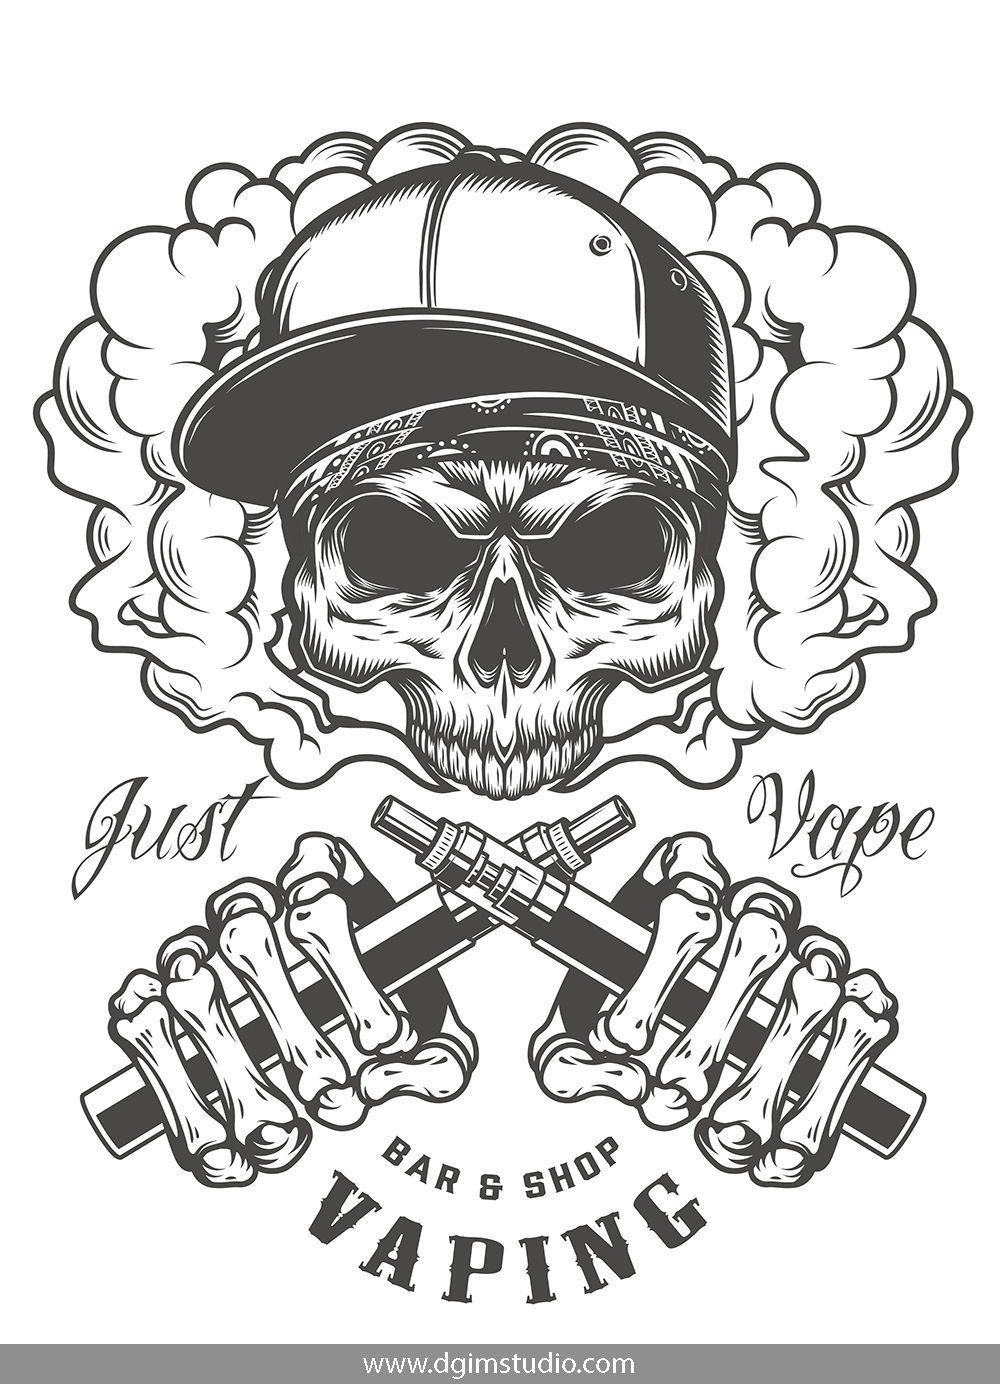 Skull creator Skull illustration, Vape, Skull design